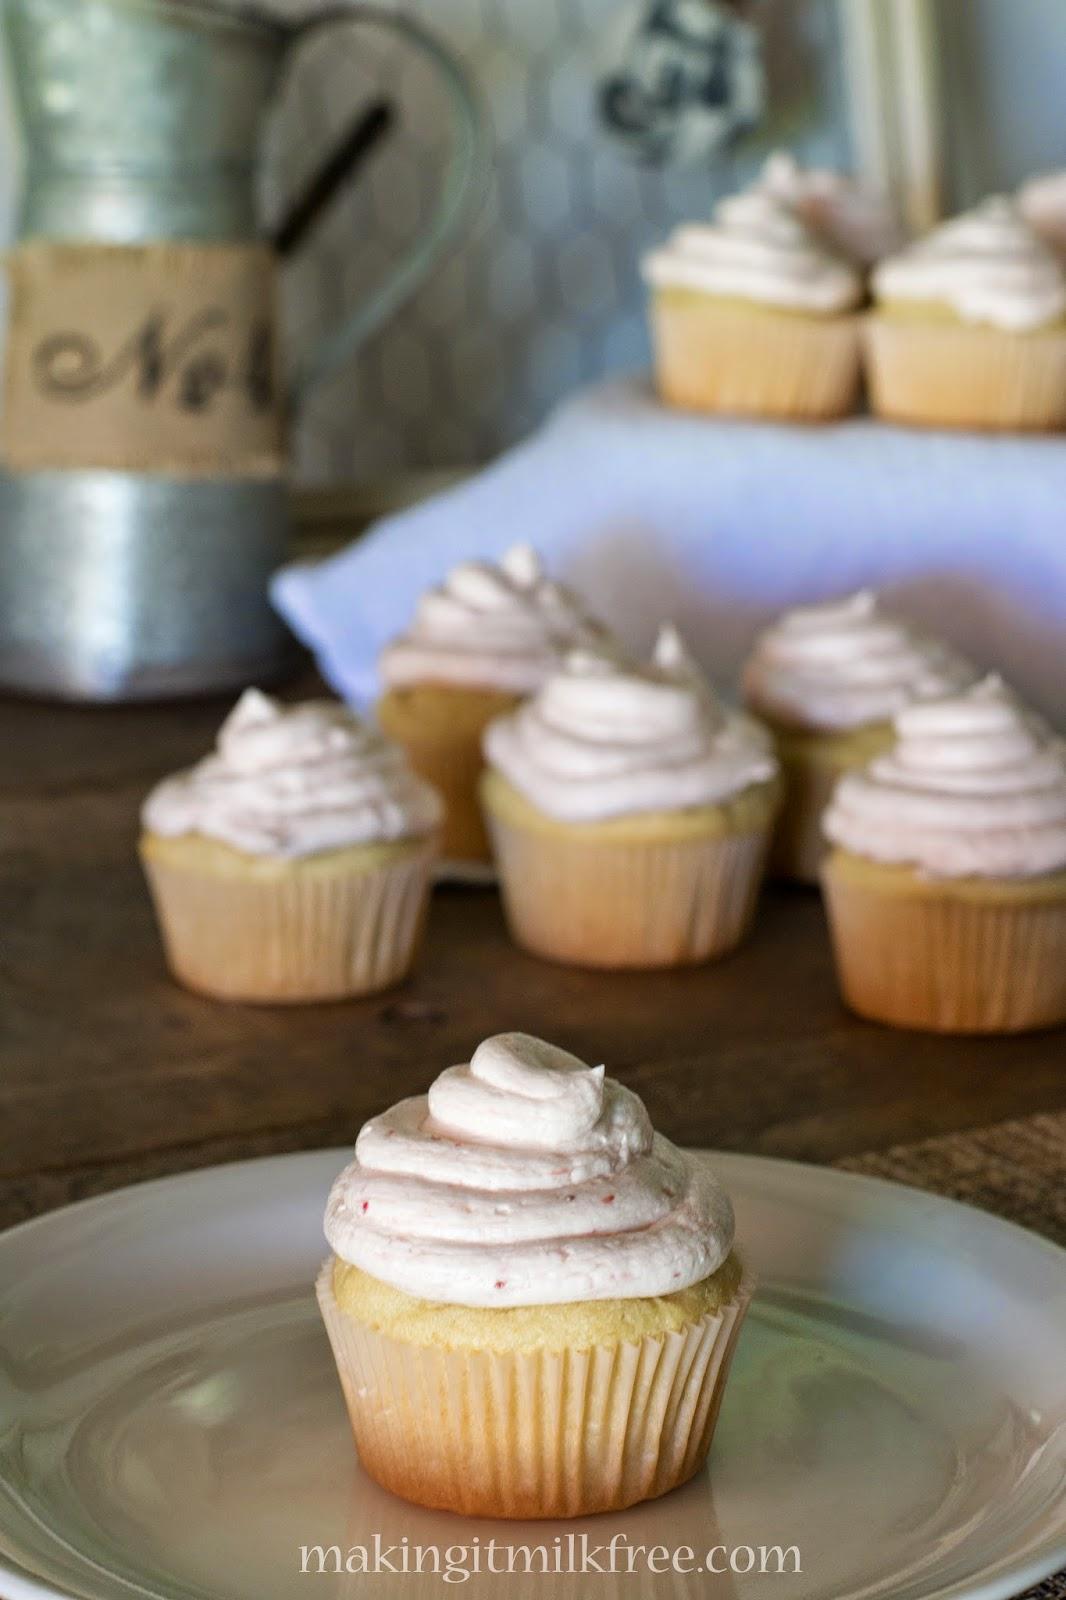 #glutenfree #dairyfree #strawberry #lemonade #cupcakes